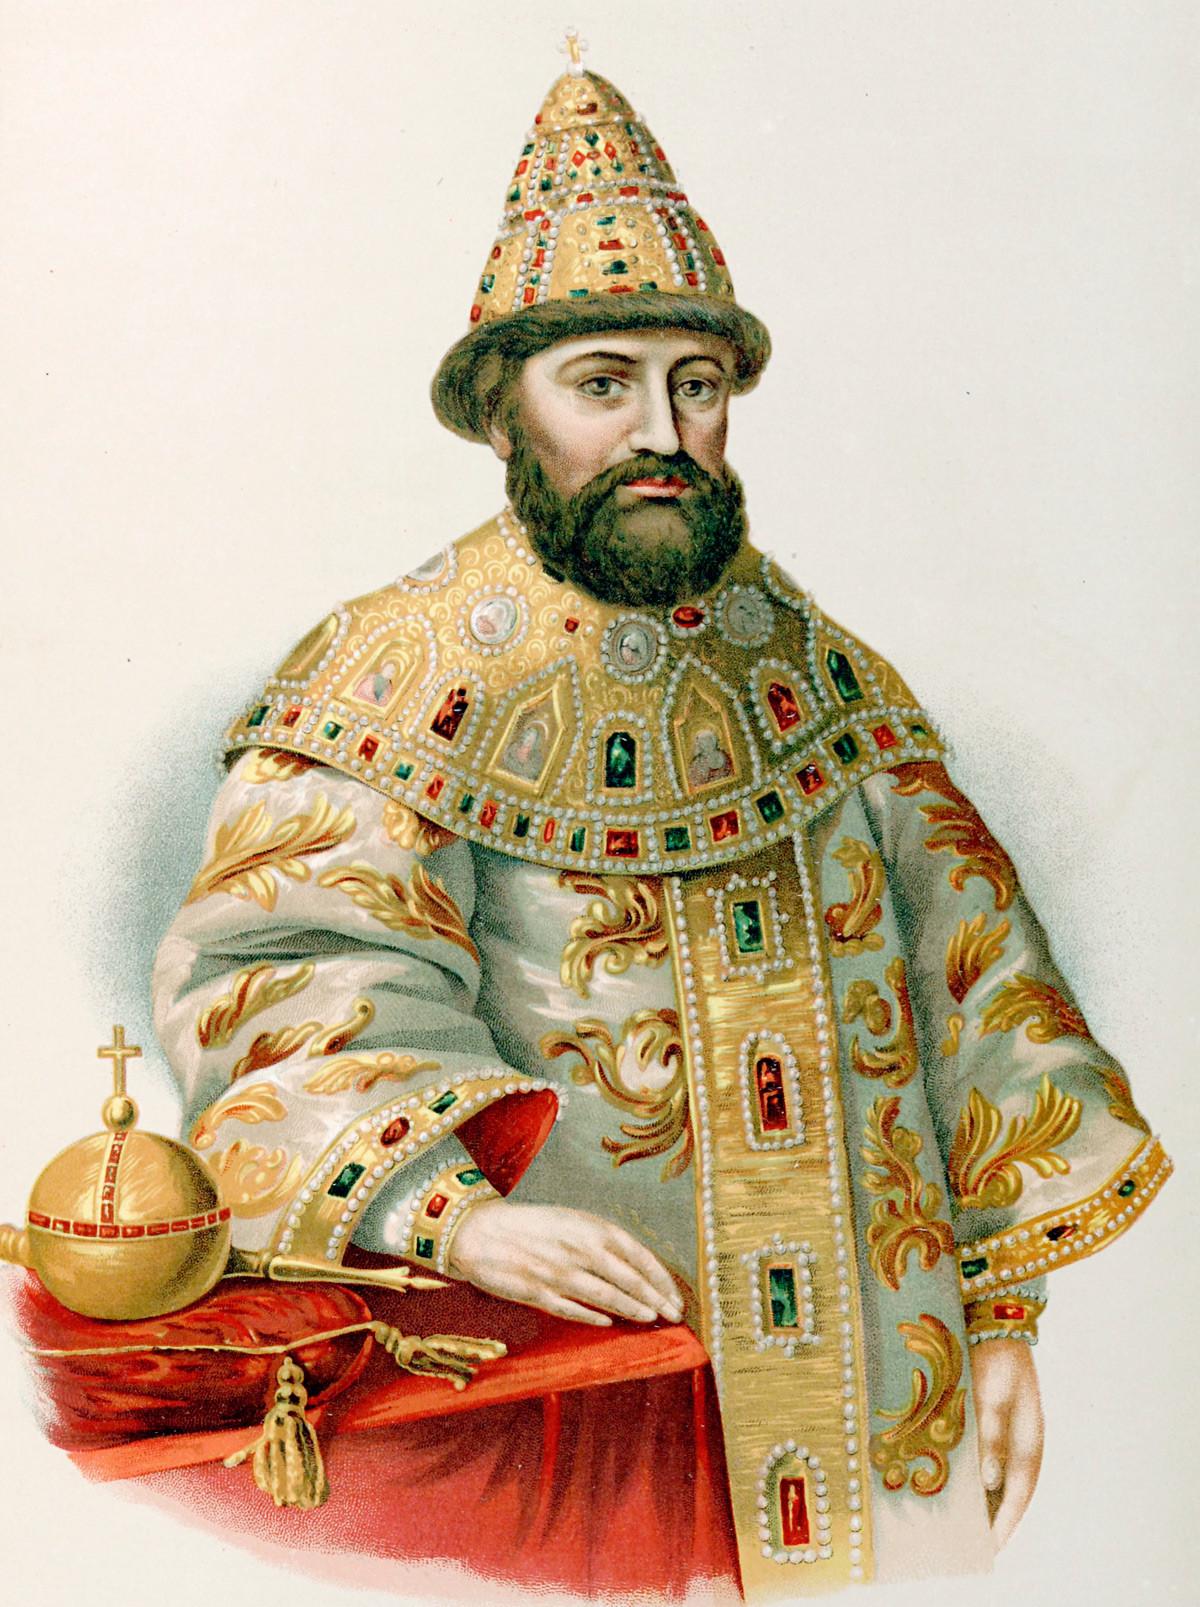 Mihail Fjodorovič (12. srpnja 1596. - 13. srpnja 1645.), prvi ruski car dinastije Romanov.